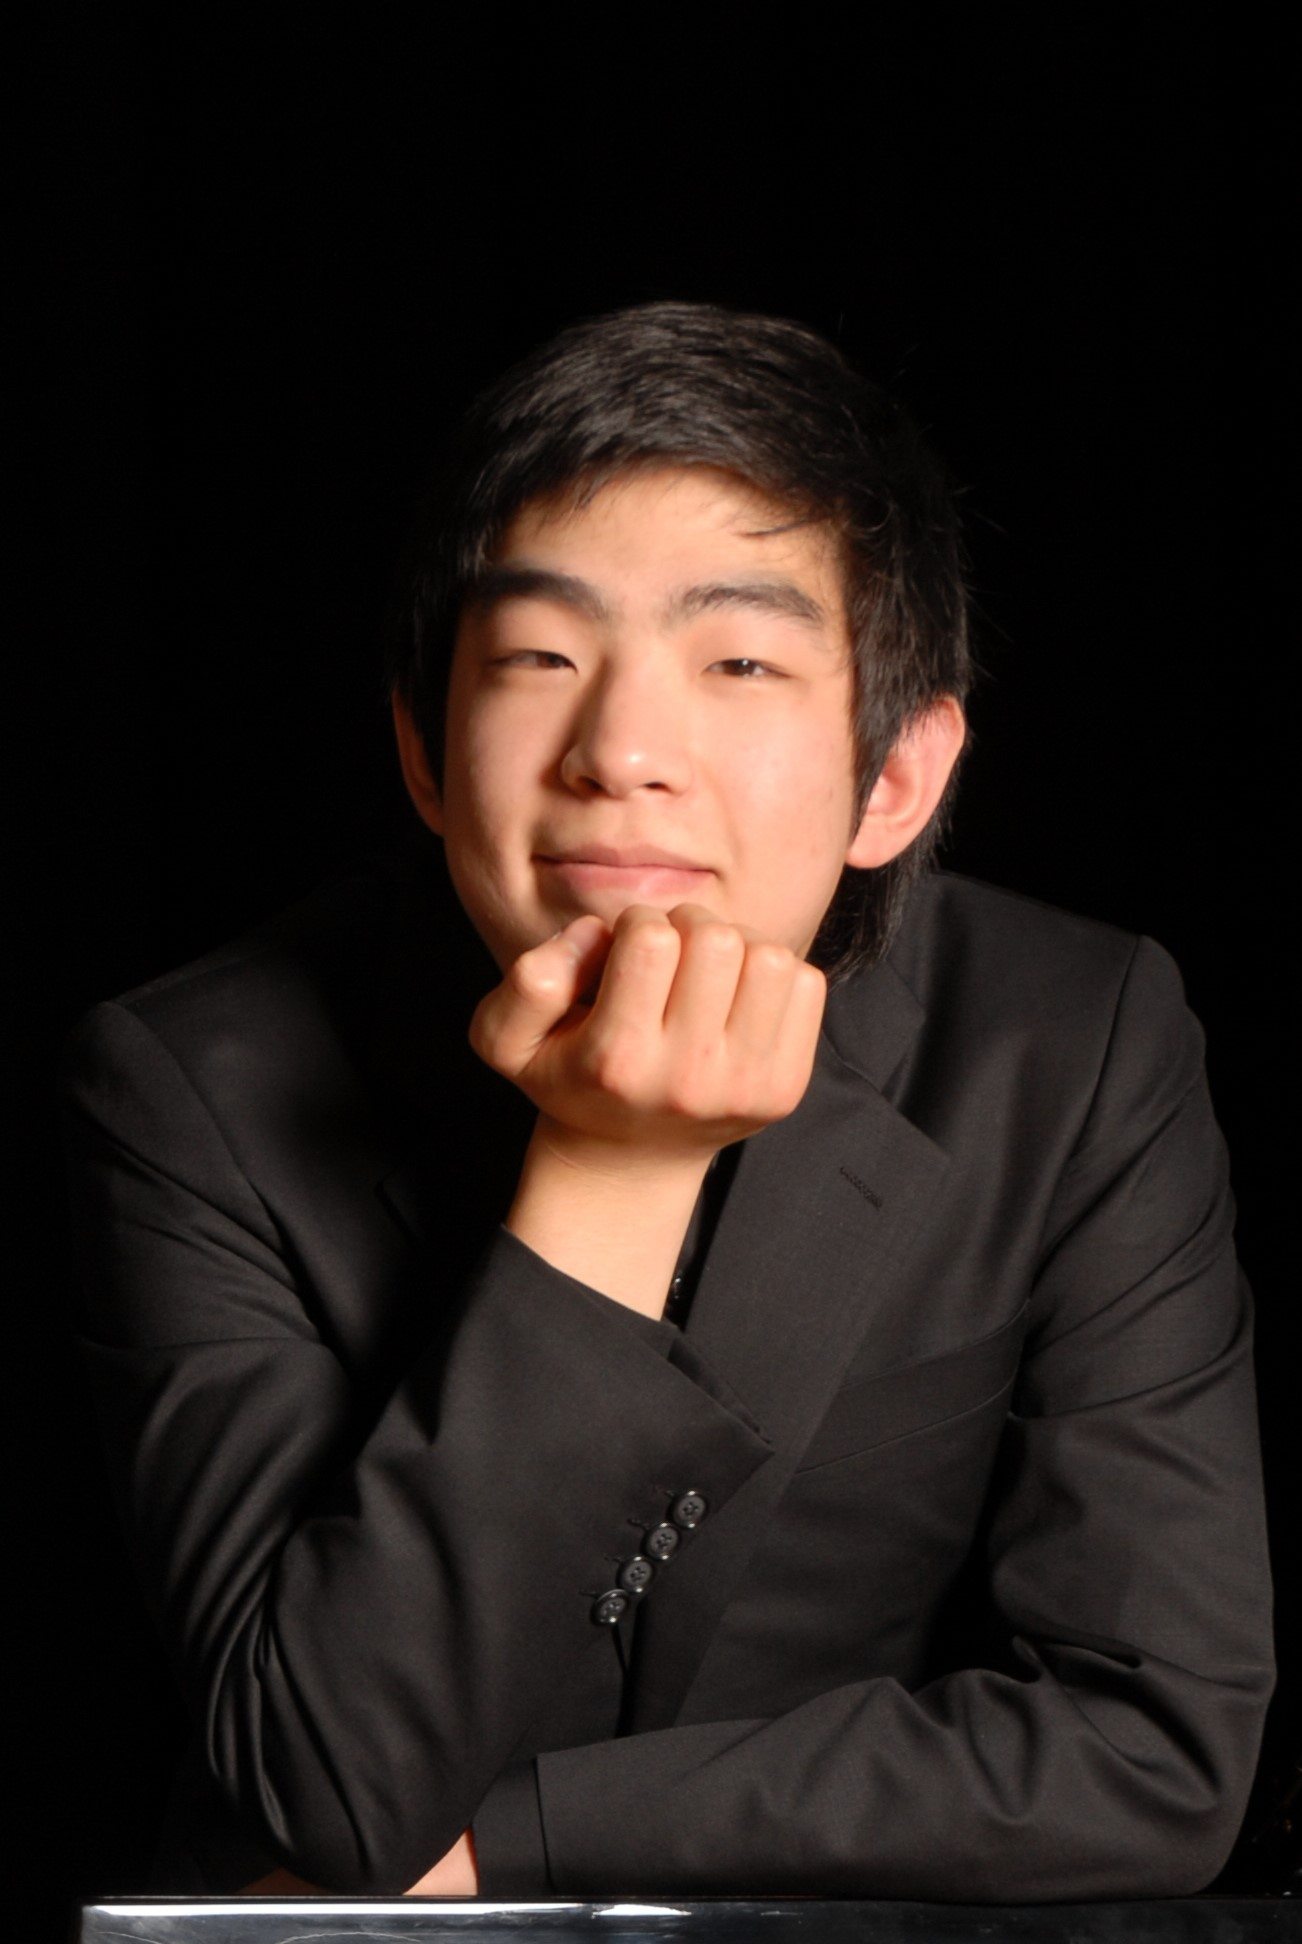 Taeg Min Nam